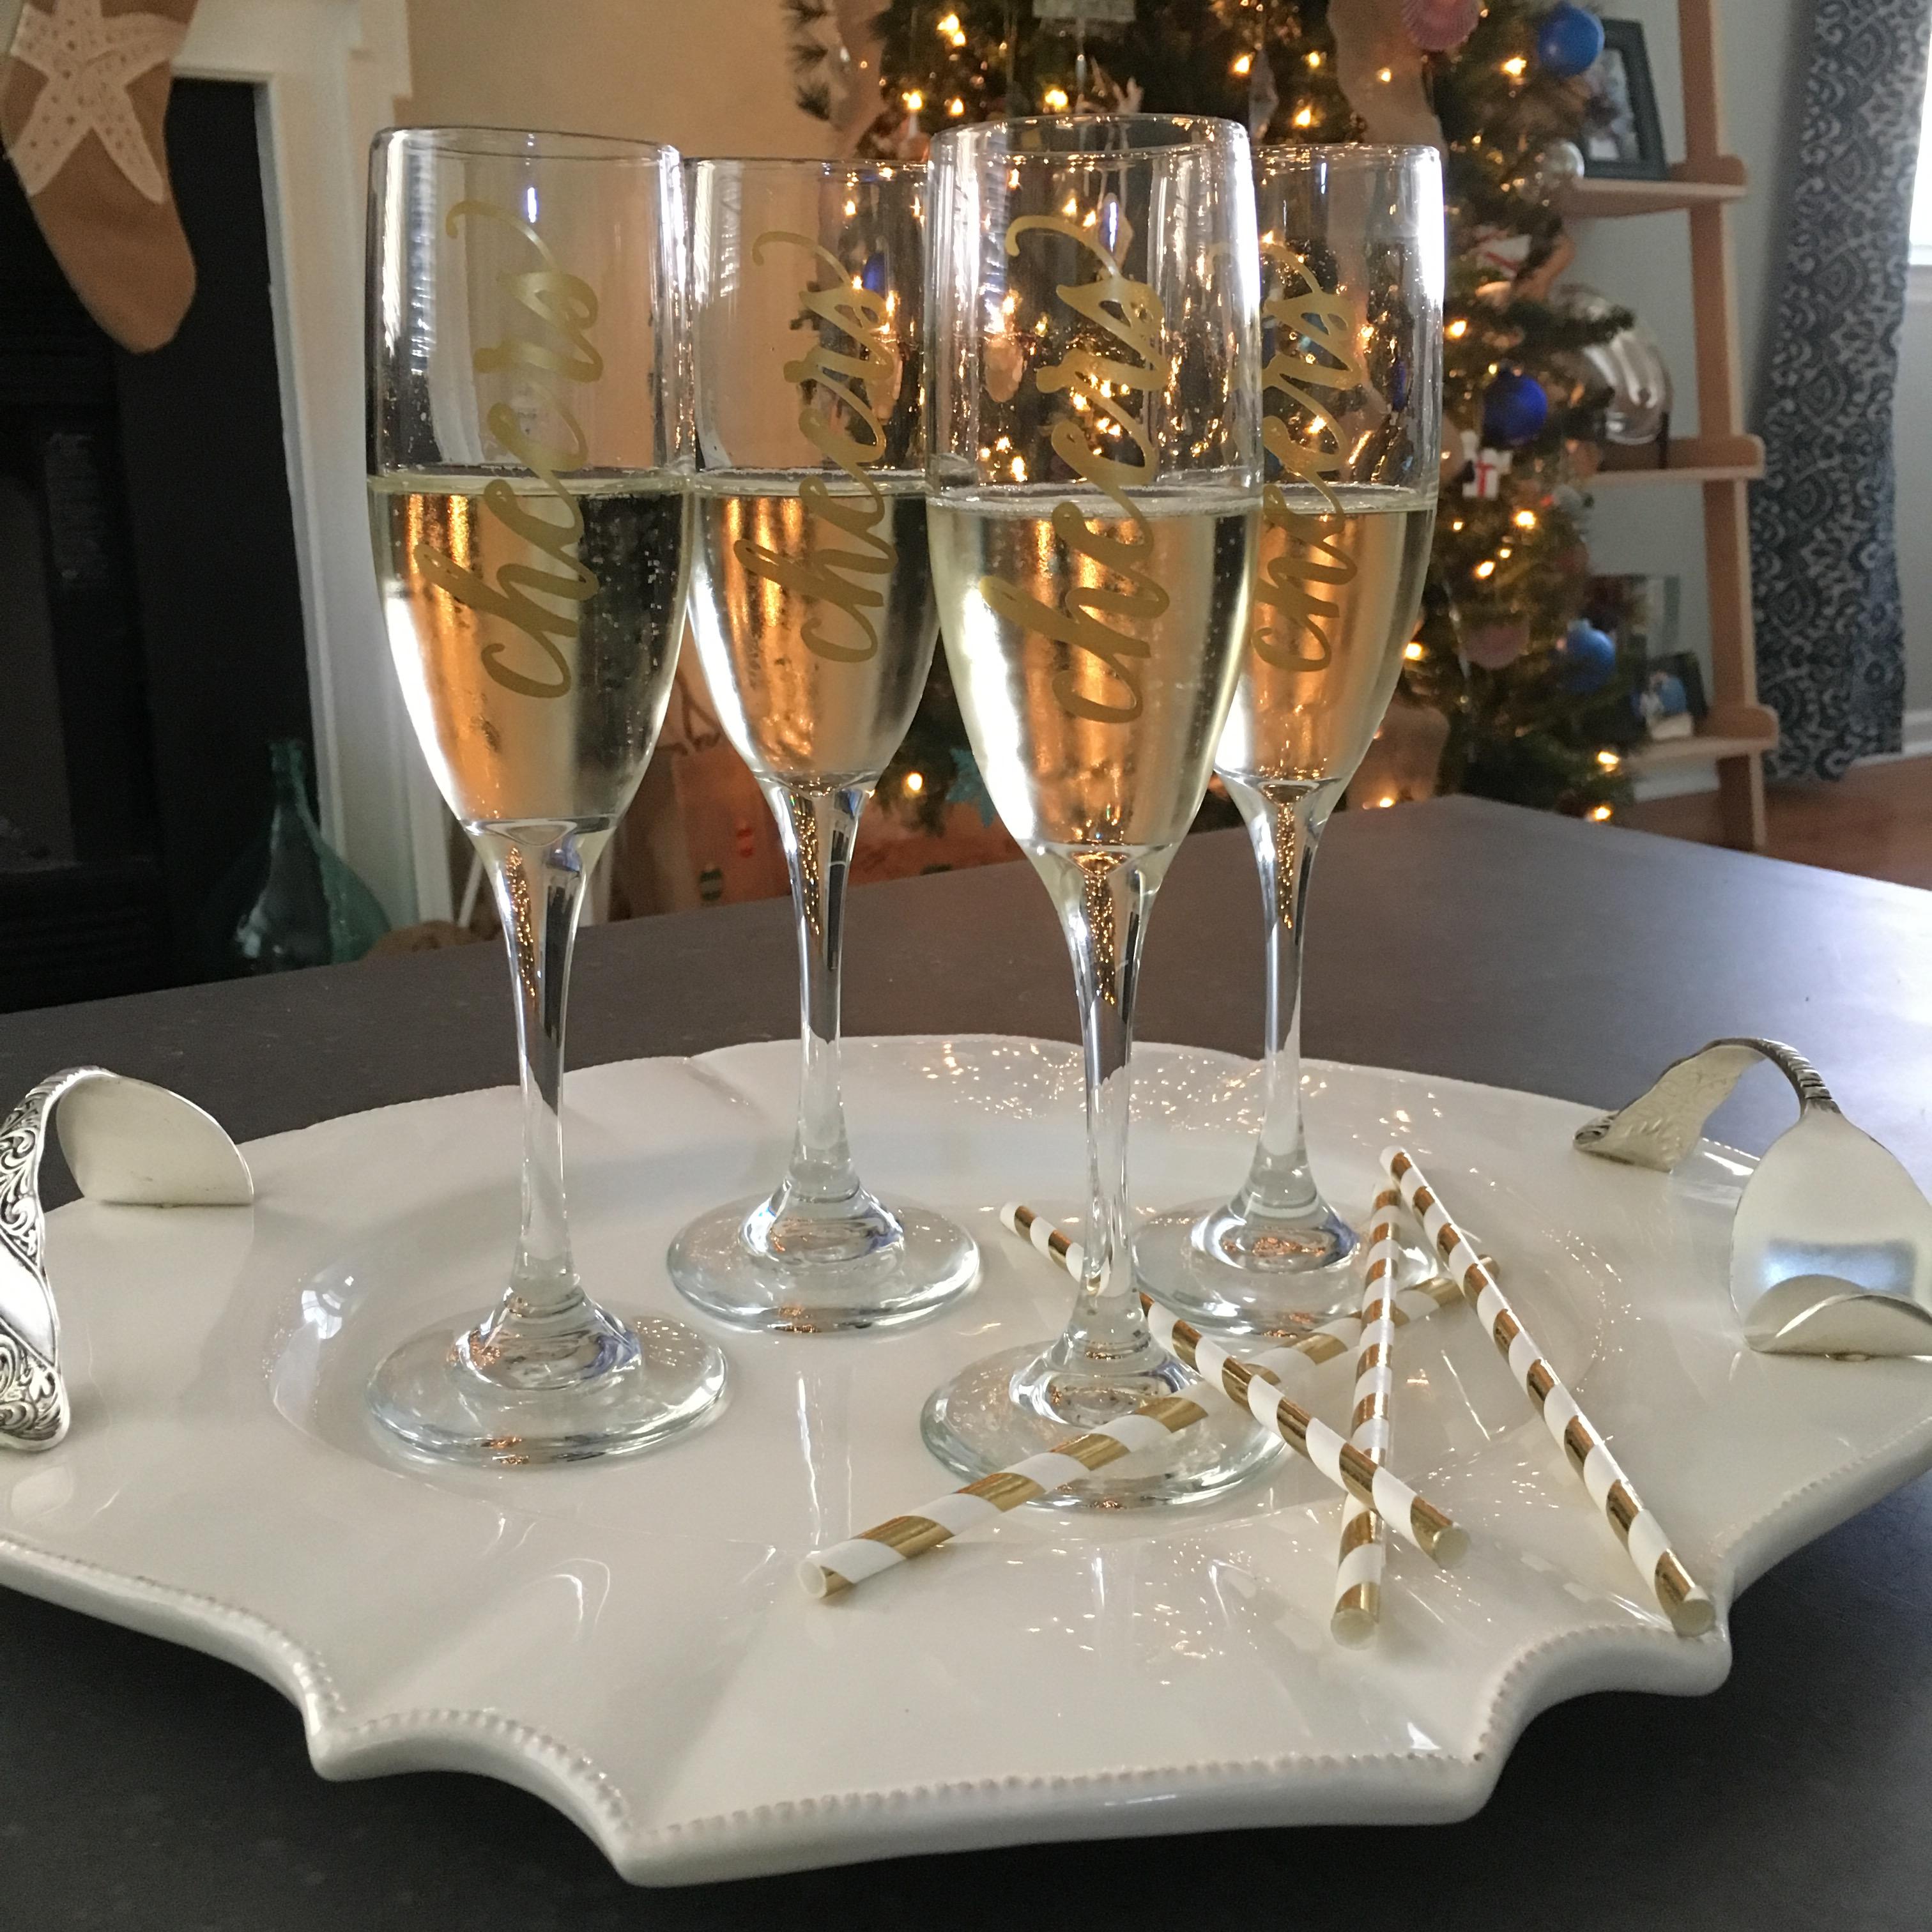 Diy Cheers Glasses For Nye With Cricut Coastal Kelder